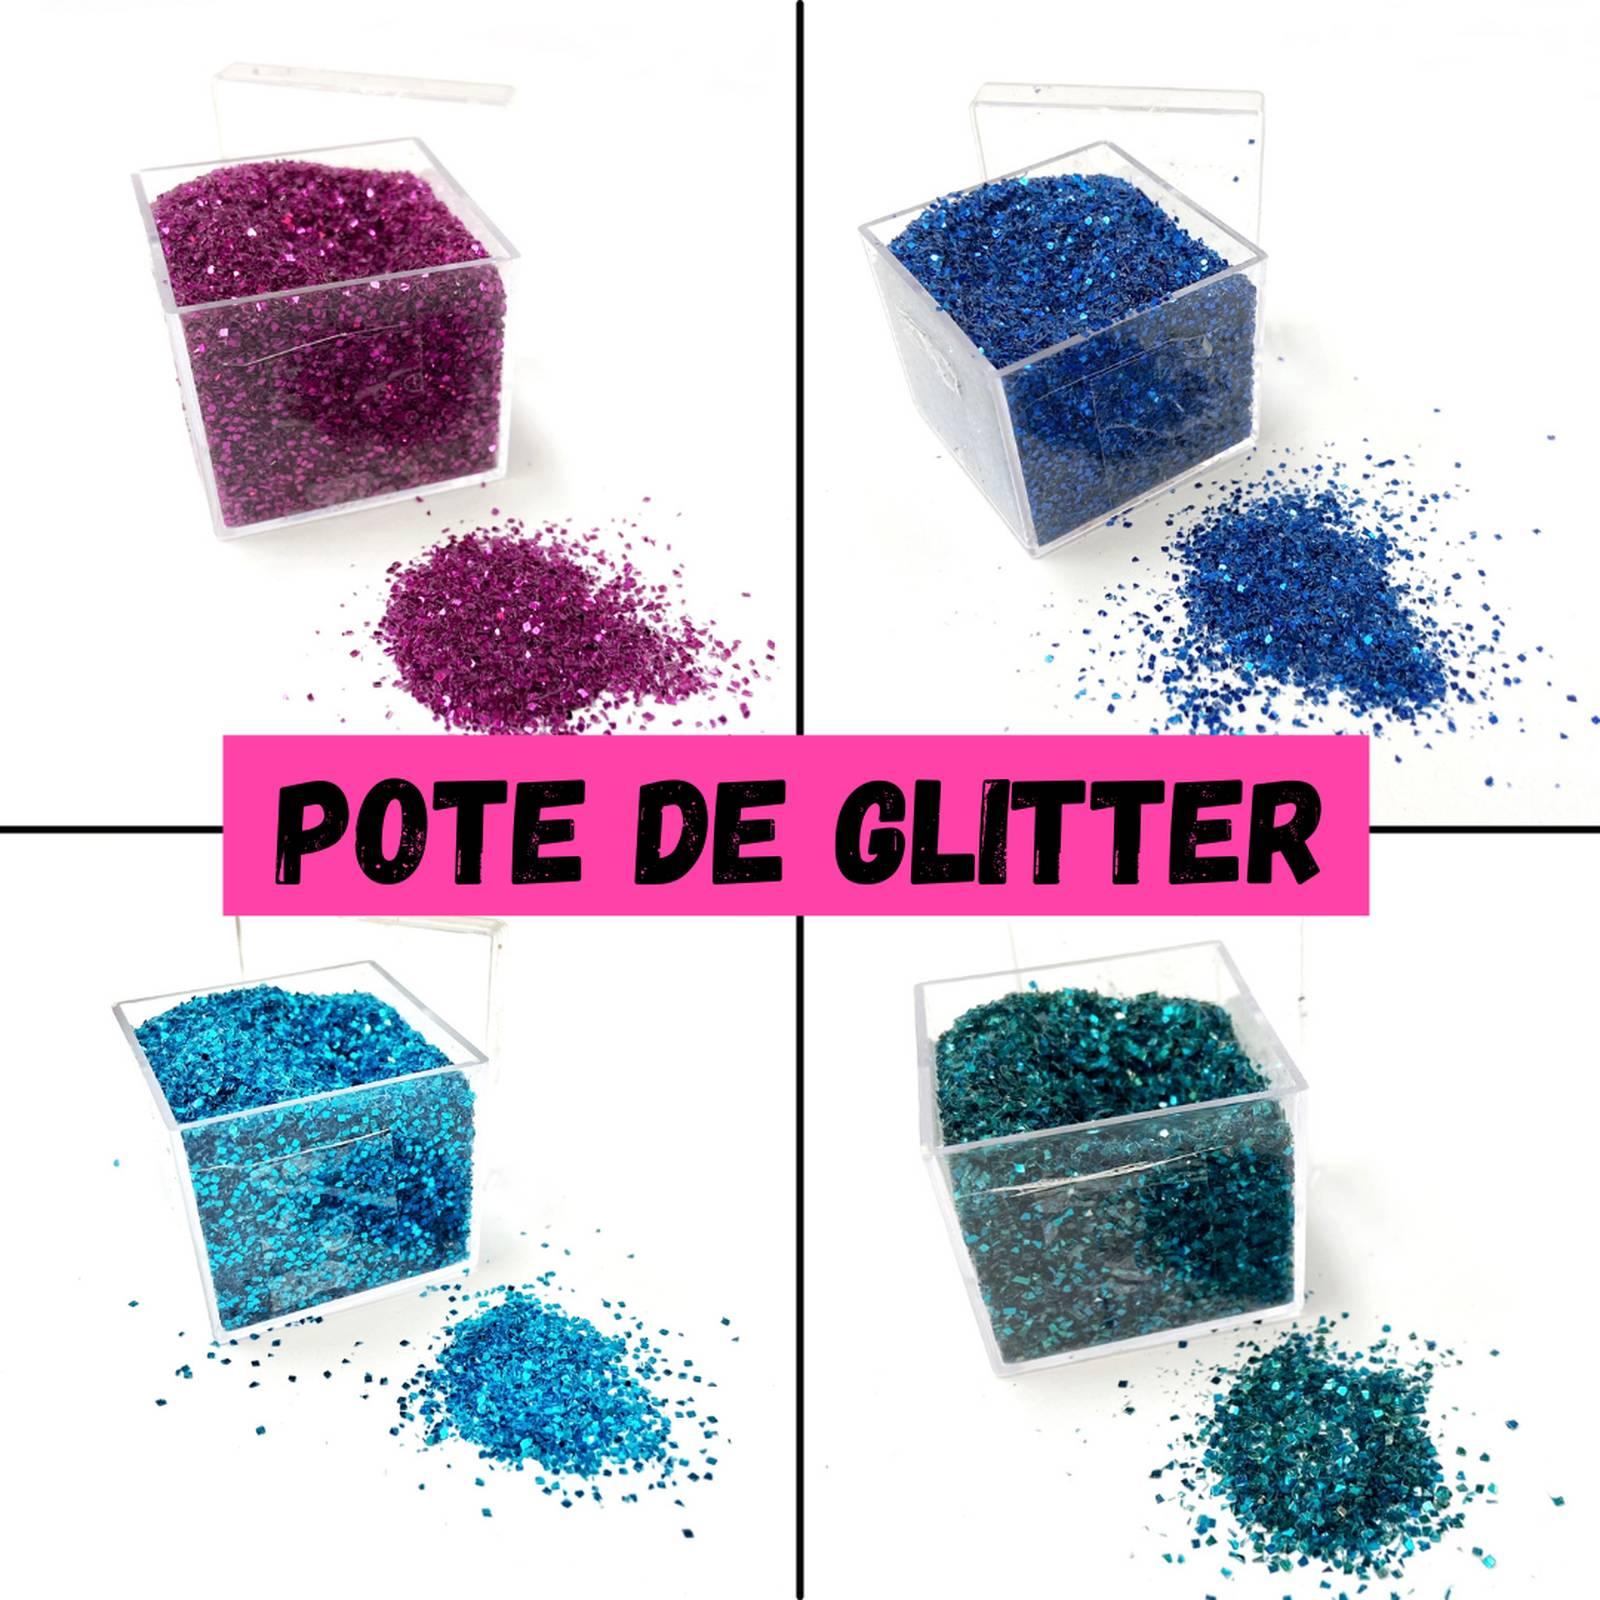 Pote Glitter Brocal - 30g